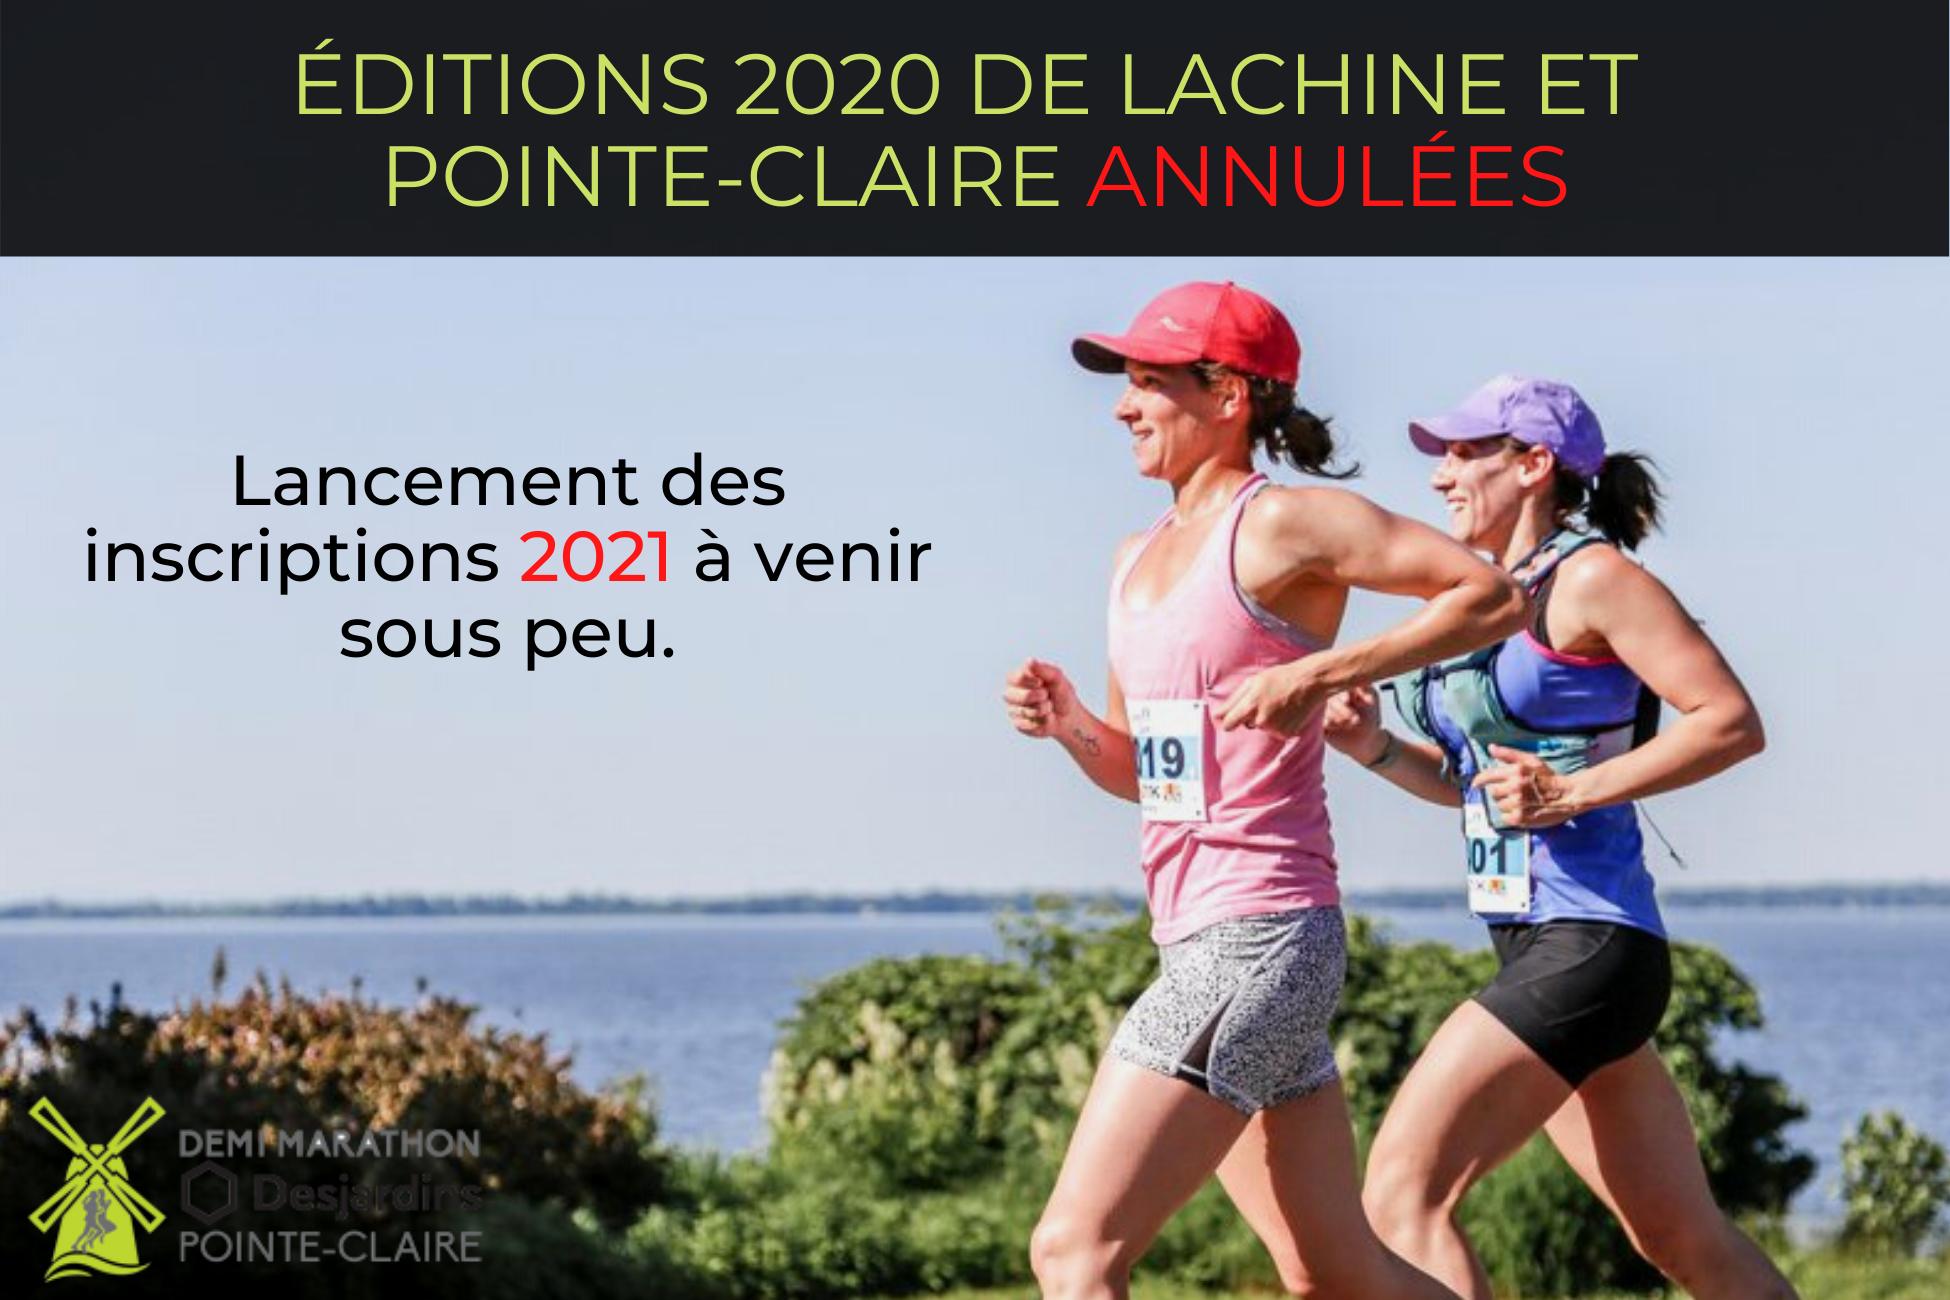 DEMI-MARATHON DE POINTE-CLAIRE 2020 - FR - ANNULE/NEXT YEAR